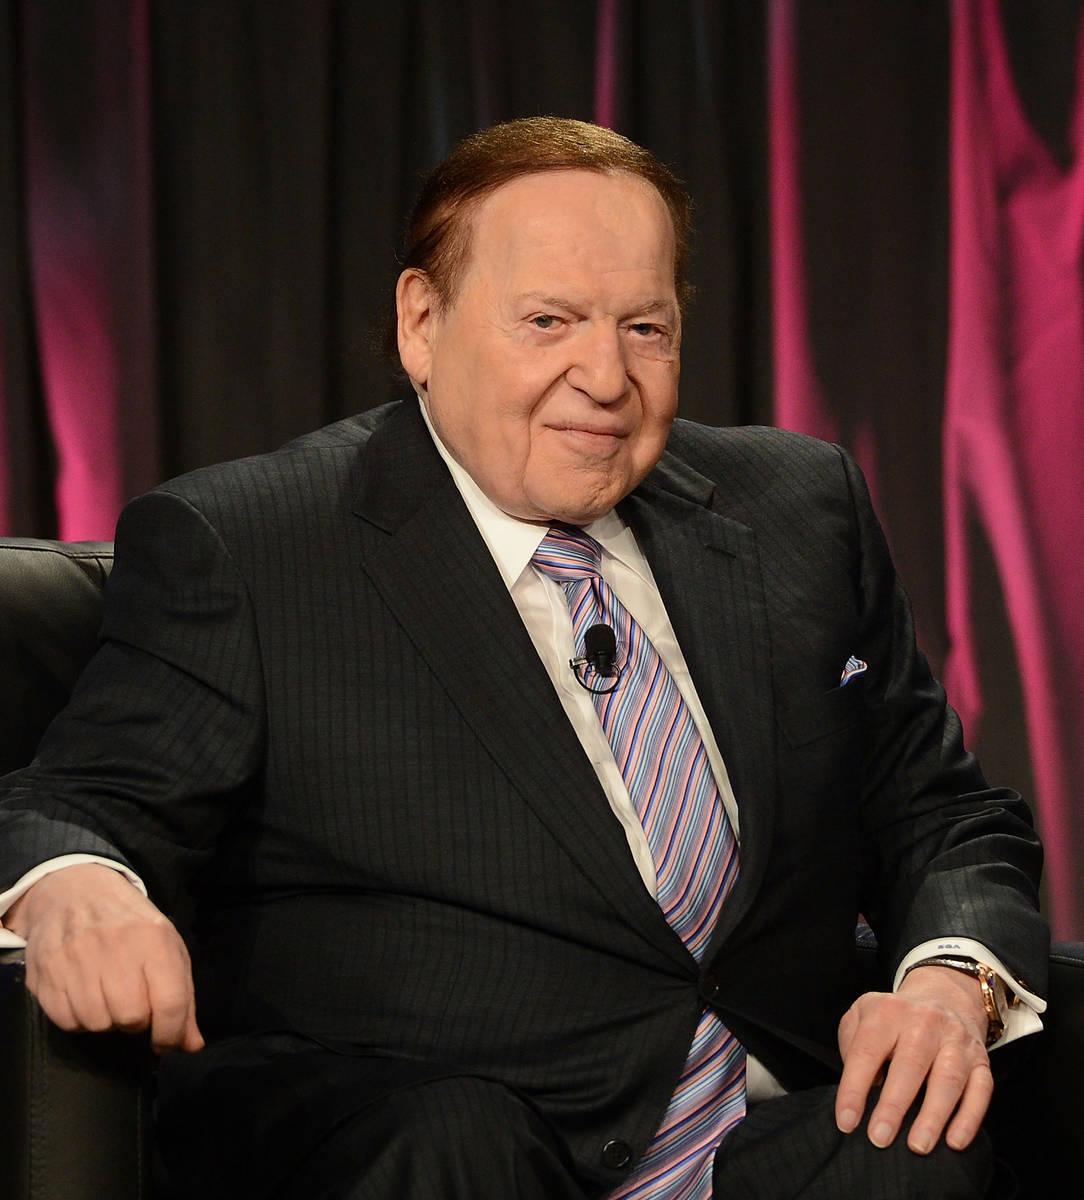 LAS VEGAS, NV - OCTOBER 01: Chairman & CEO Las Vegas Sands Corp., Sheldon Adelson speaks a ...